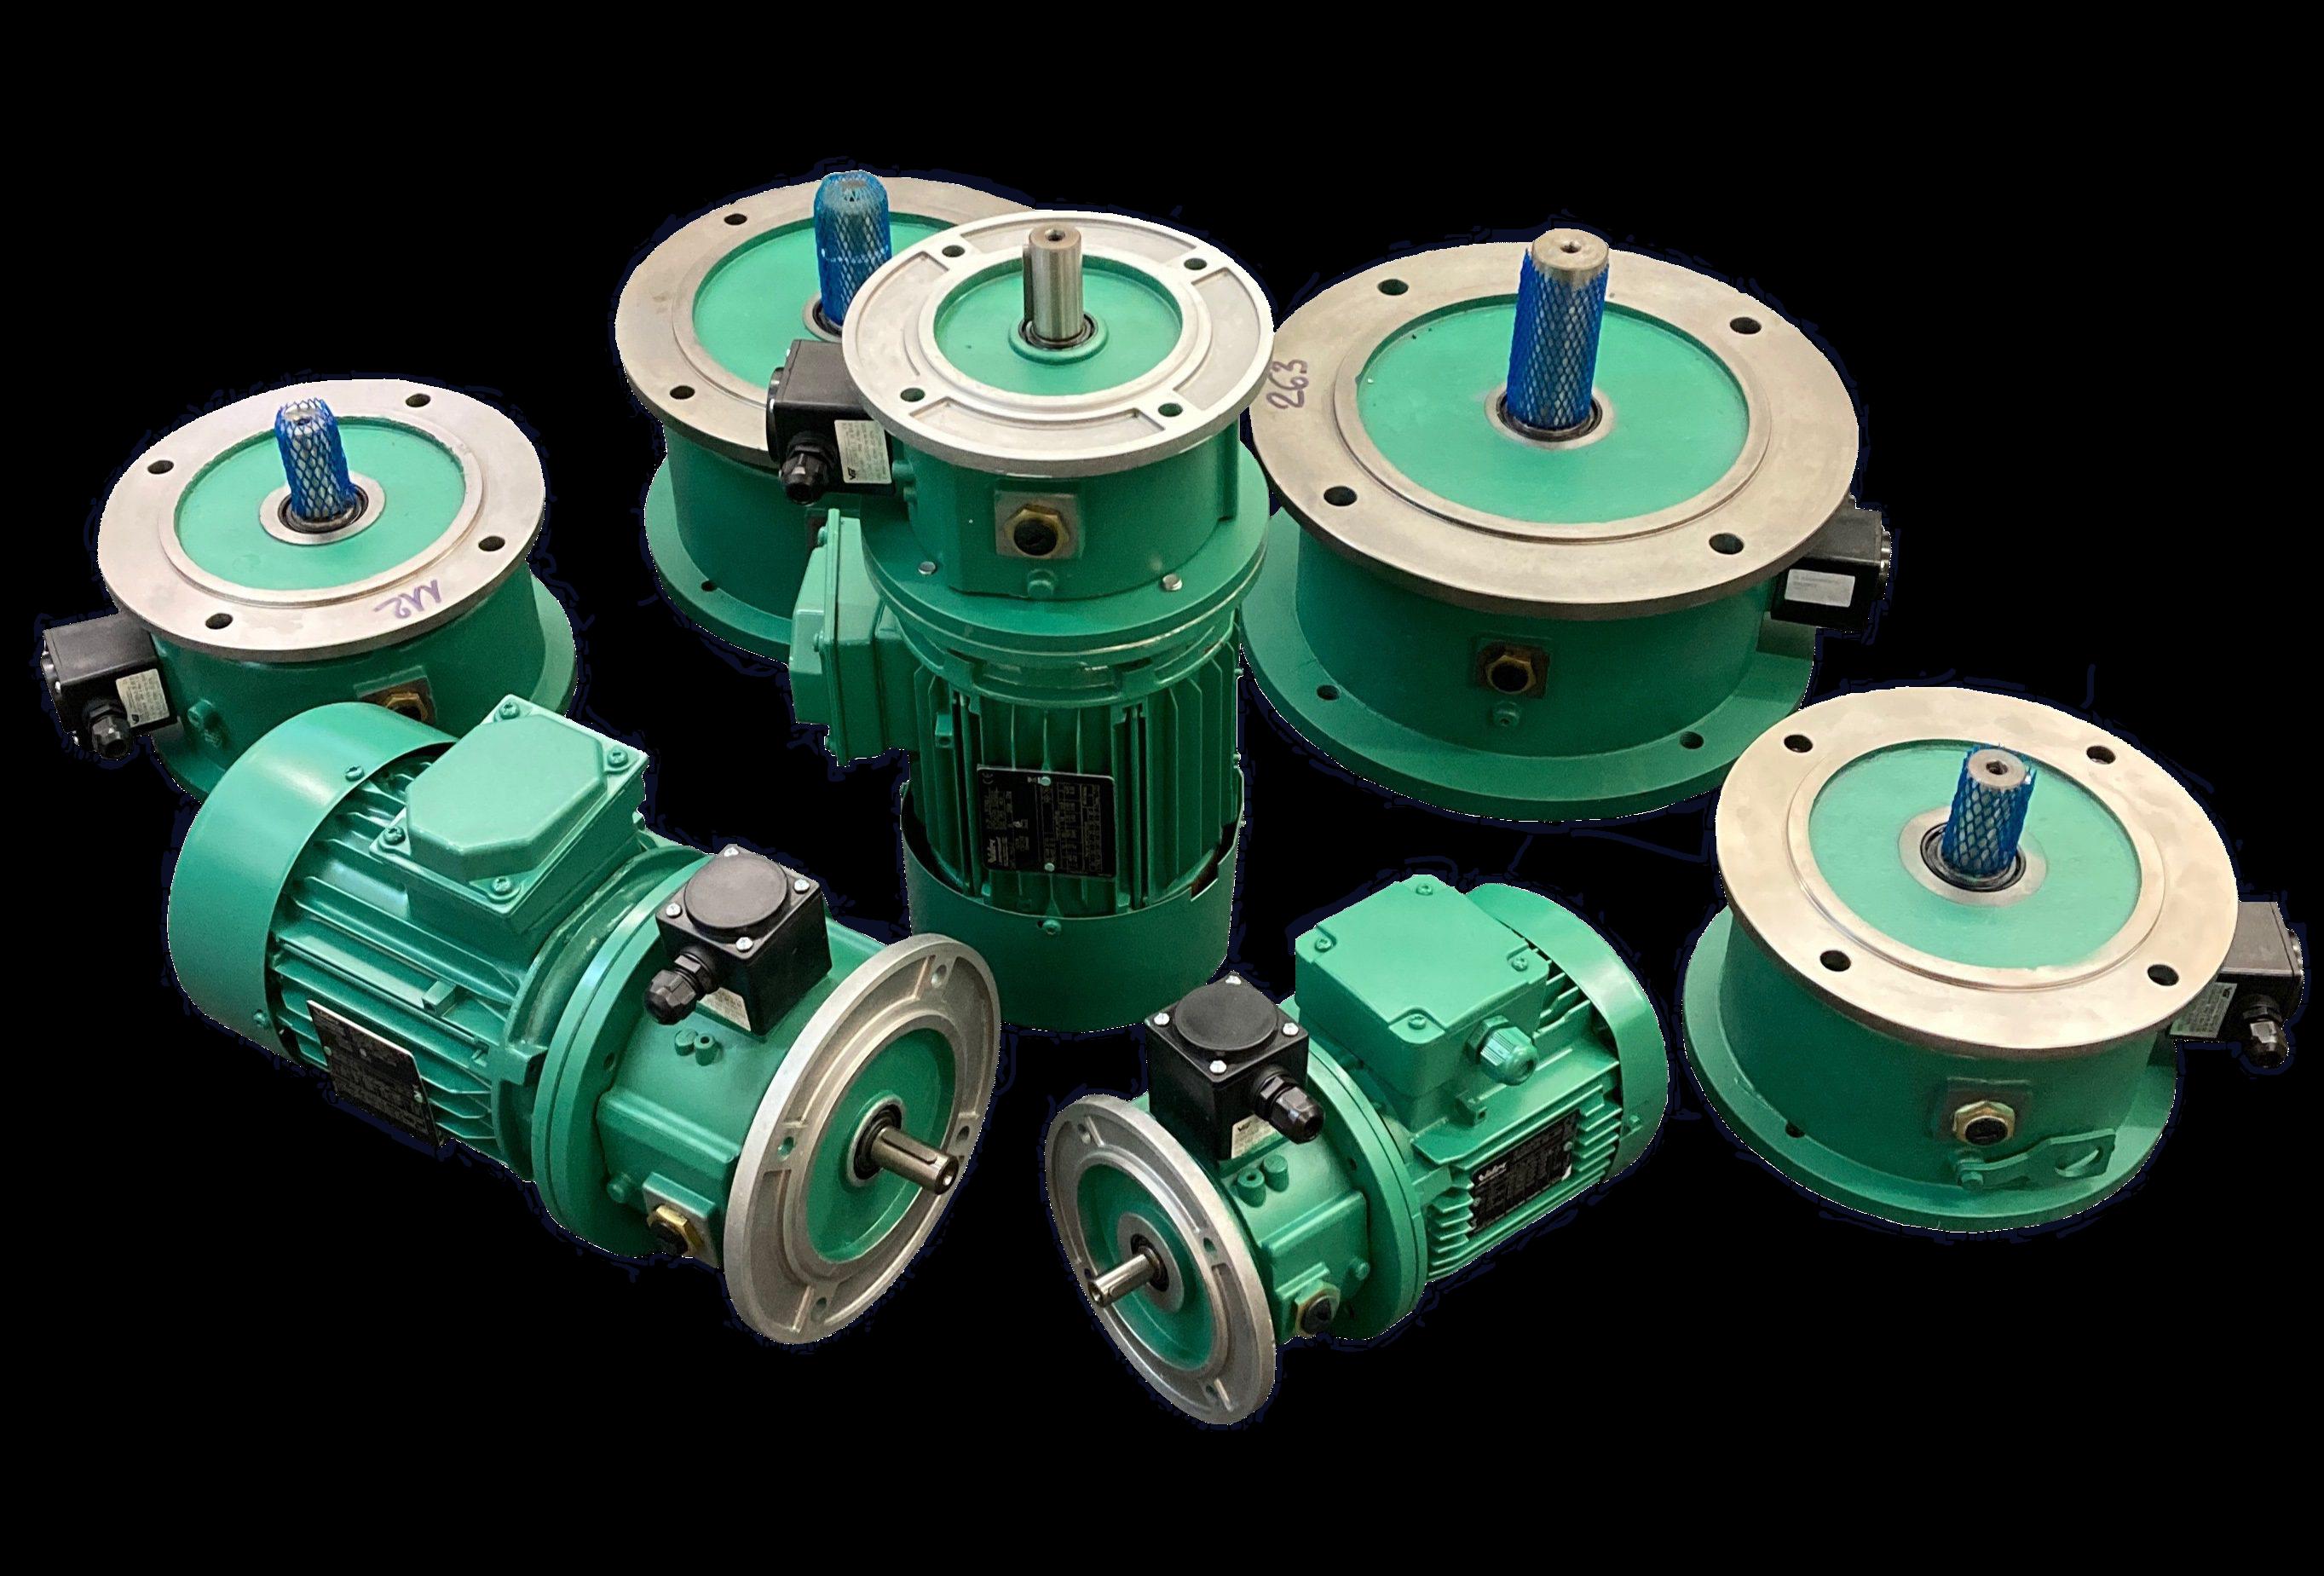 IEC Brakes of VIS Company